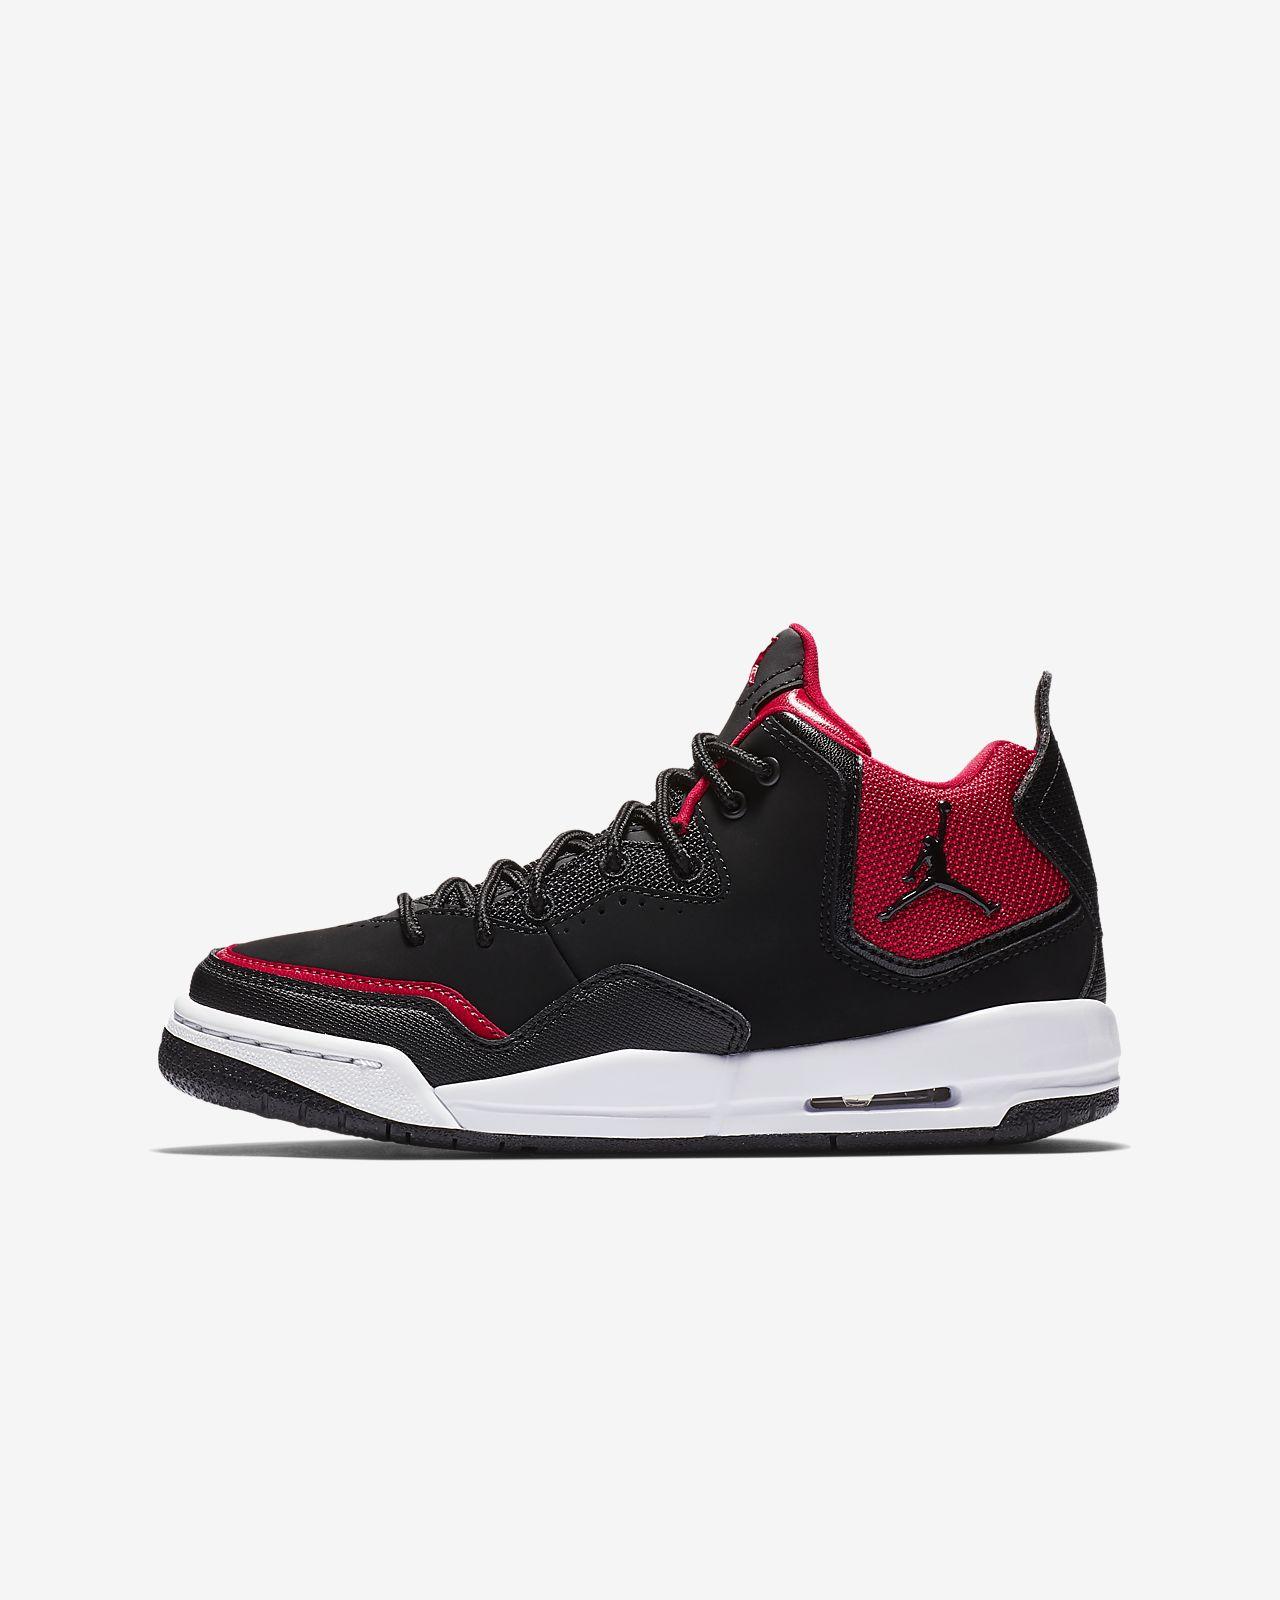 e435d1c4c11 Calzado para niños talla grande Jordan Courtside 23. Nike.com CL